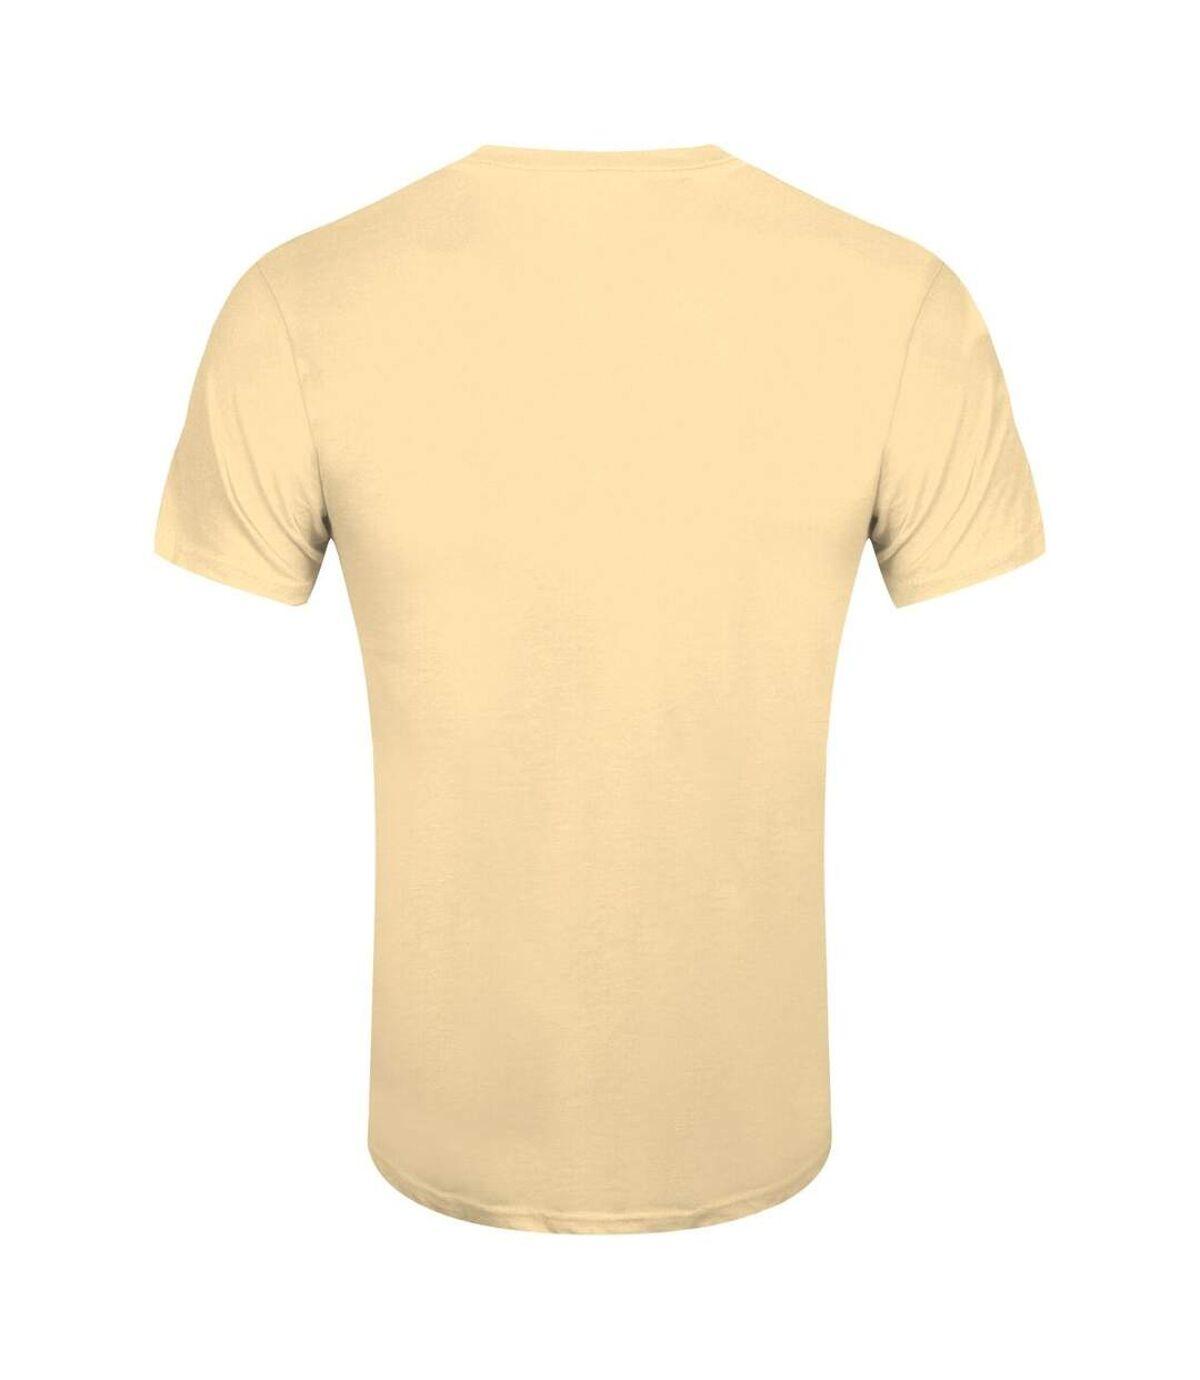 Grindstore Mens Symbolic Viking T-Shirt (Haze Yellow) - UTGR2899